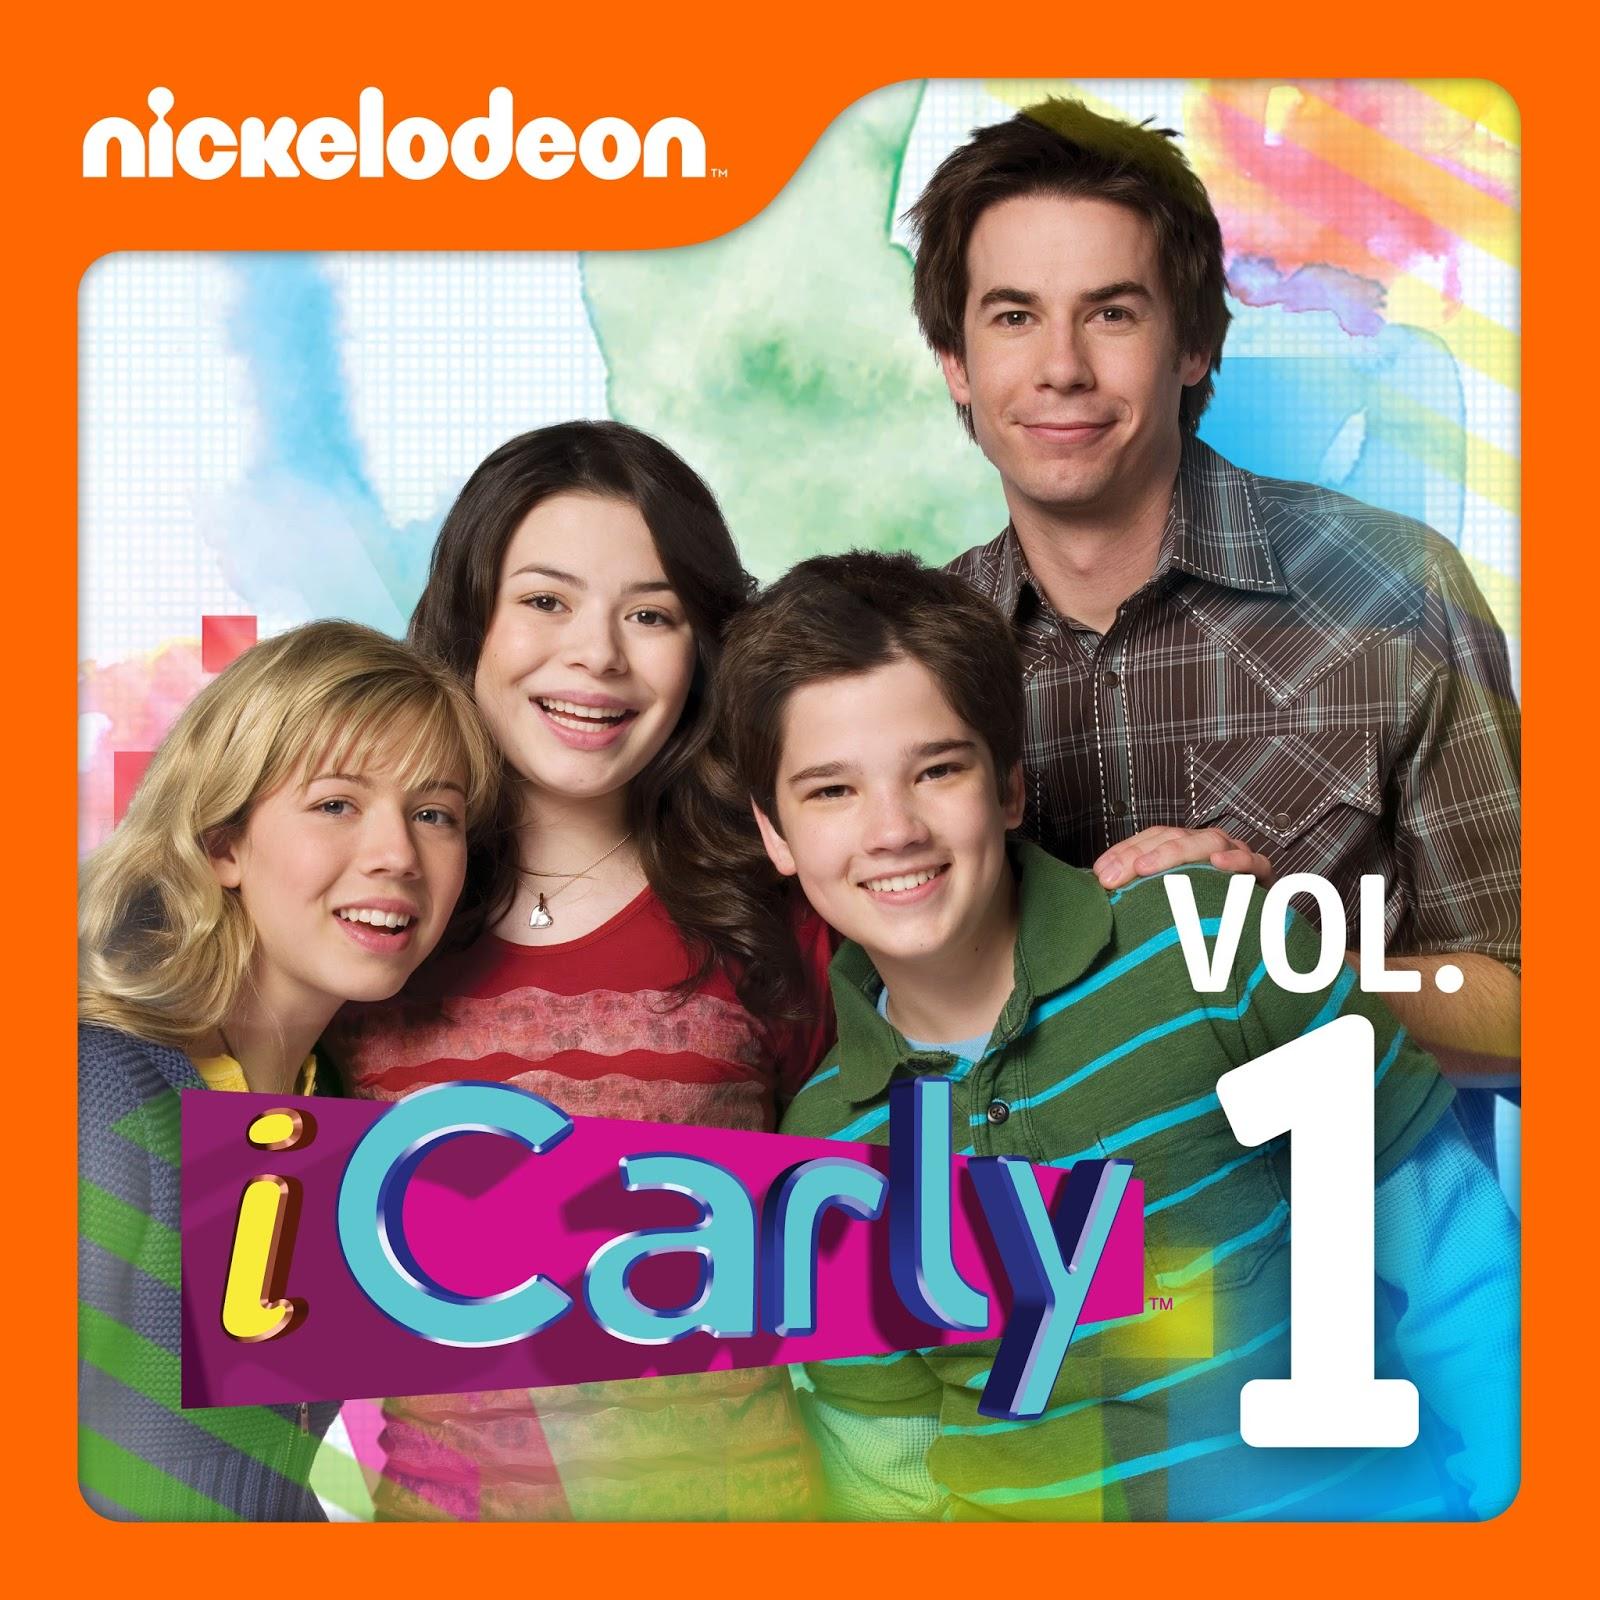 Icarly 6 Temporada Cool icarly) s01 completa [480p,1080p][dual] | itunesmaxhd